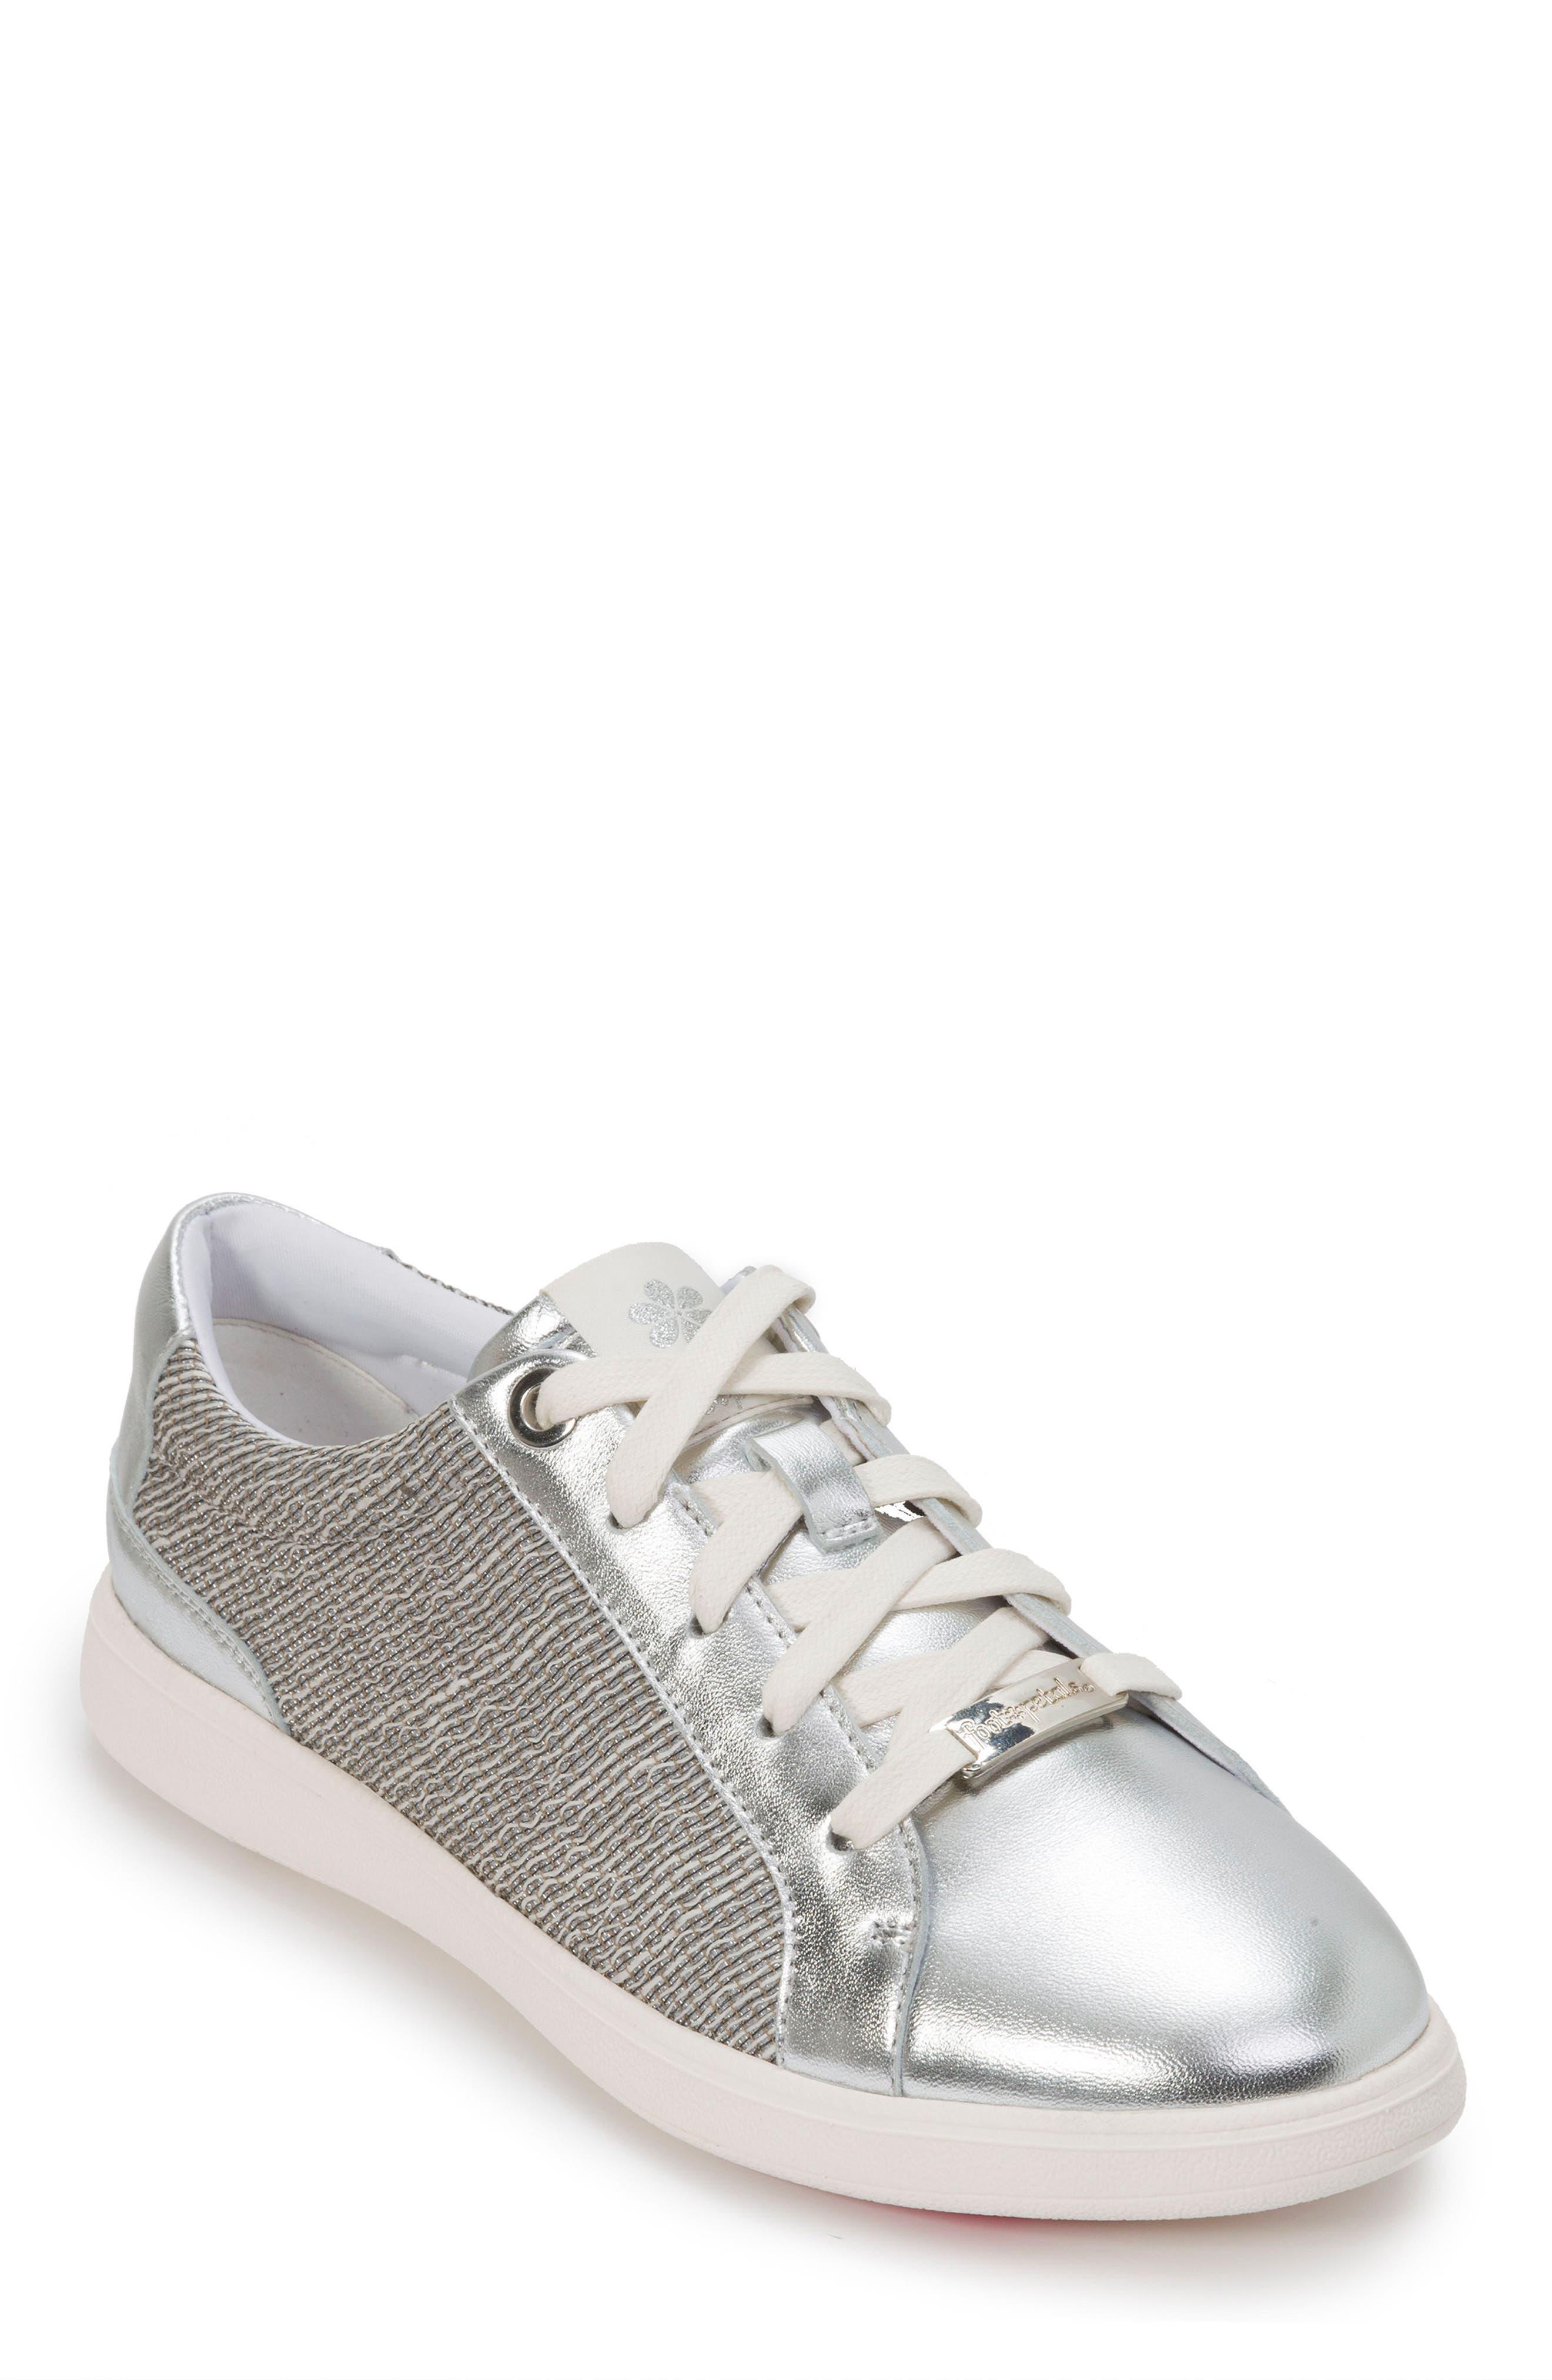 Andi Sneaker,                         Main,                         color, SILVER LEATHER